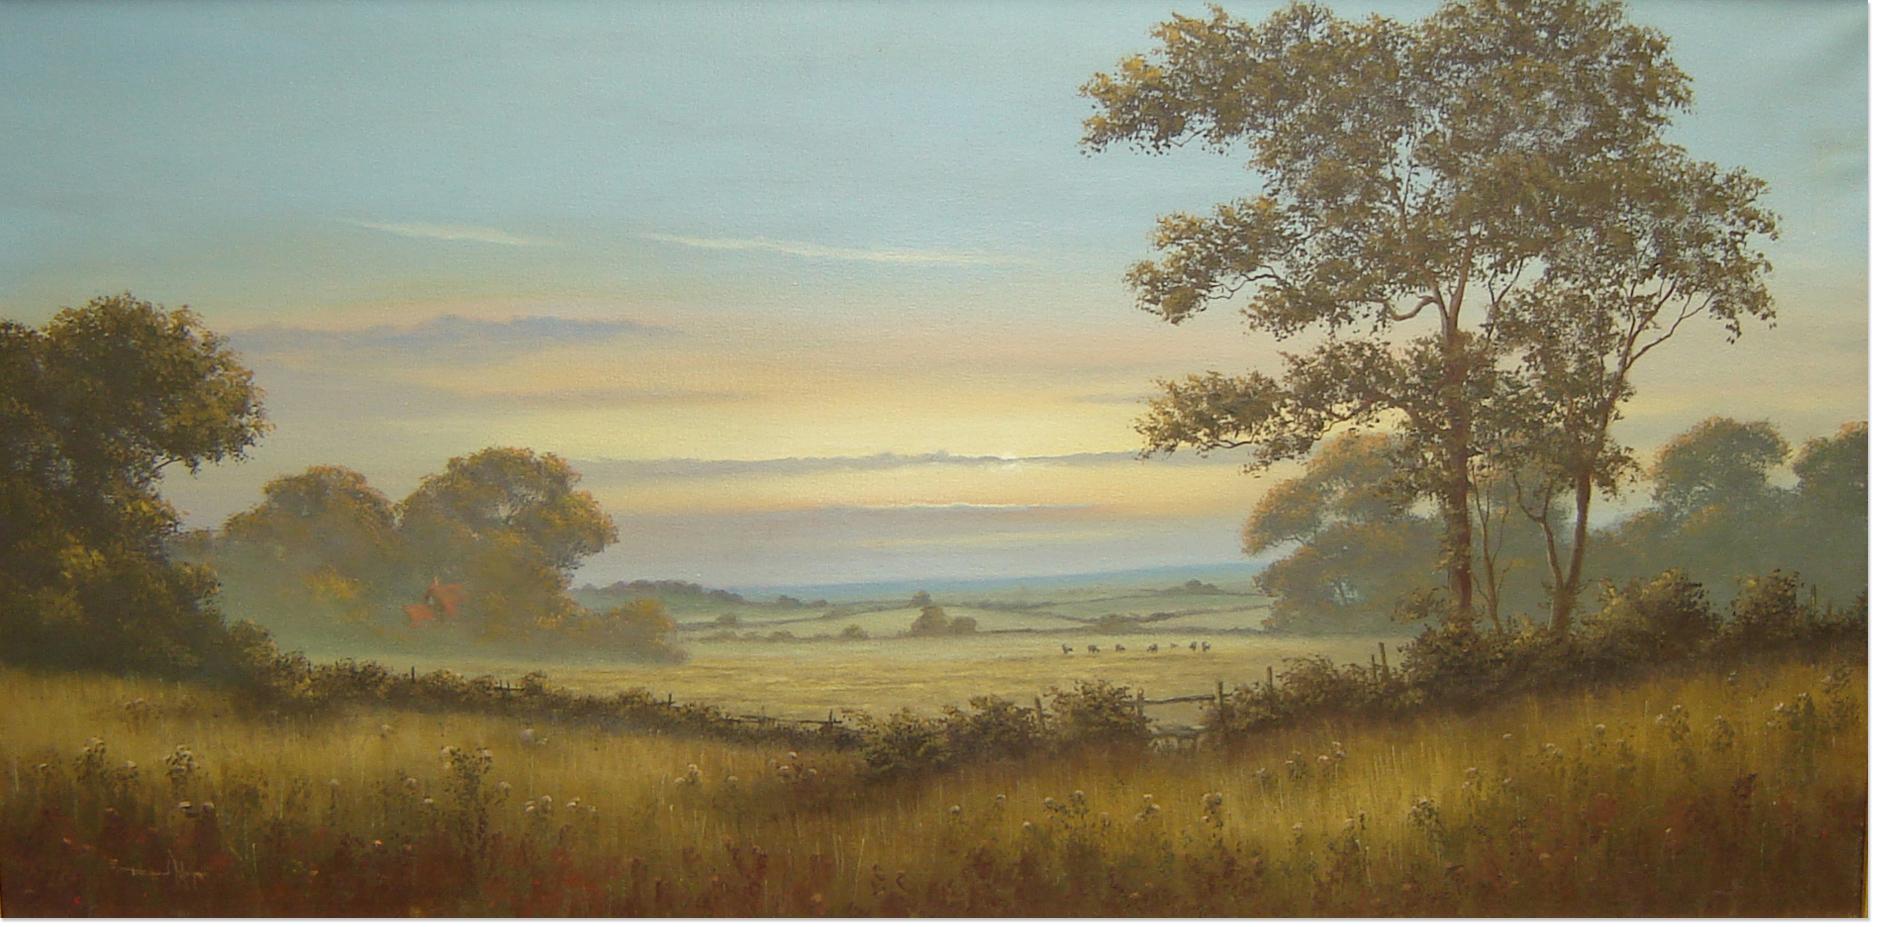 David Morgan, Oil on canvas, Landscape, click to enlarge